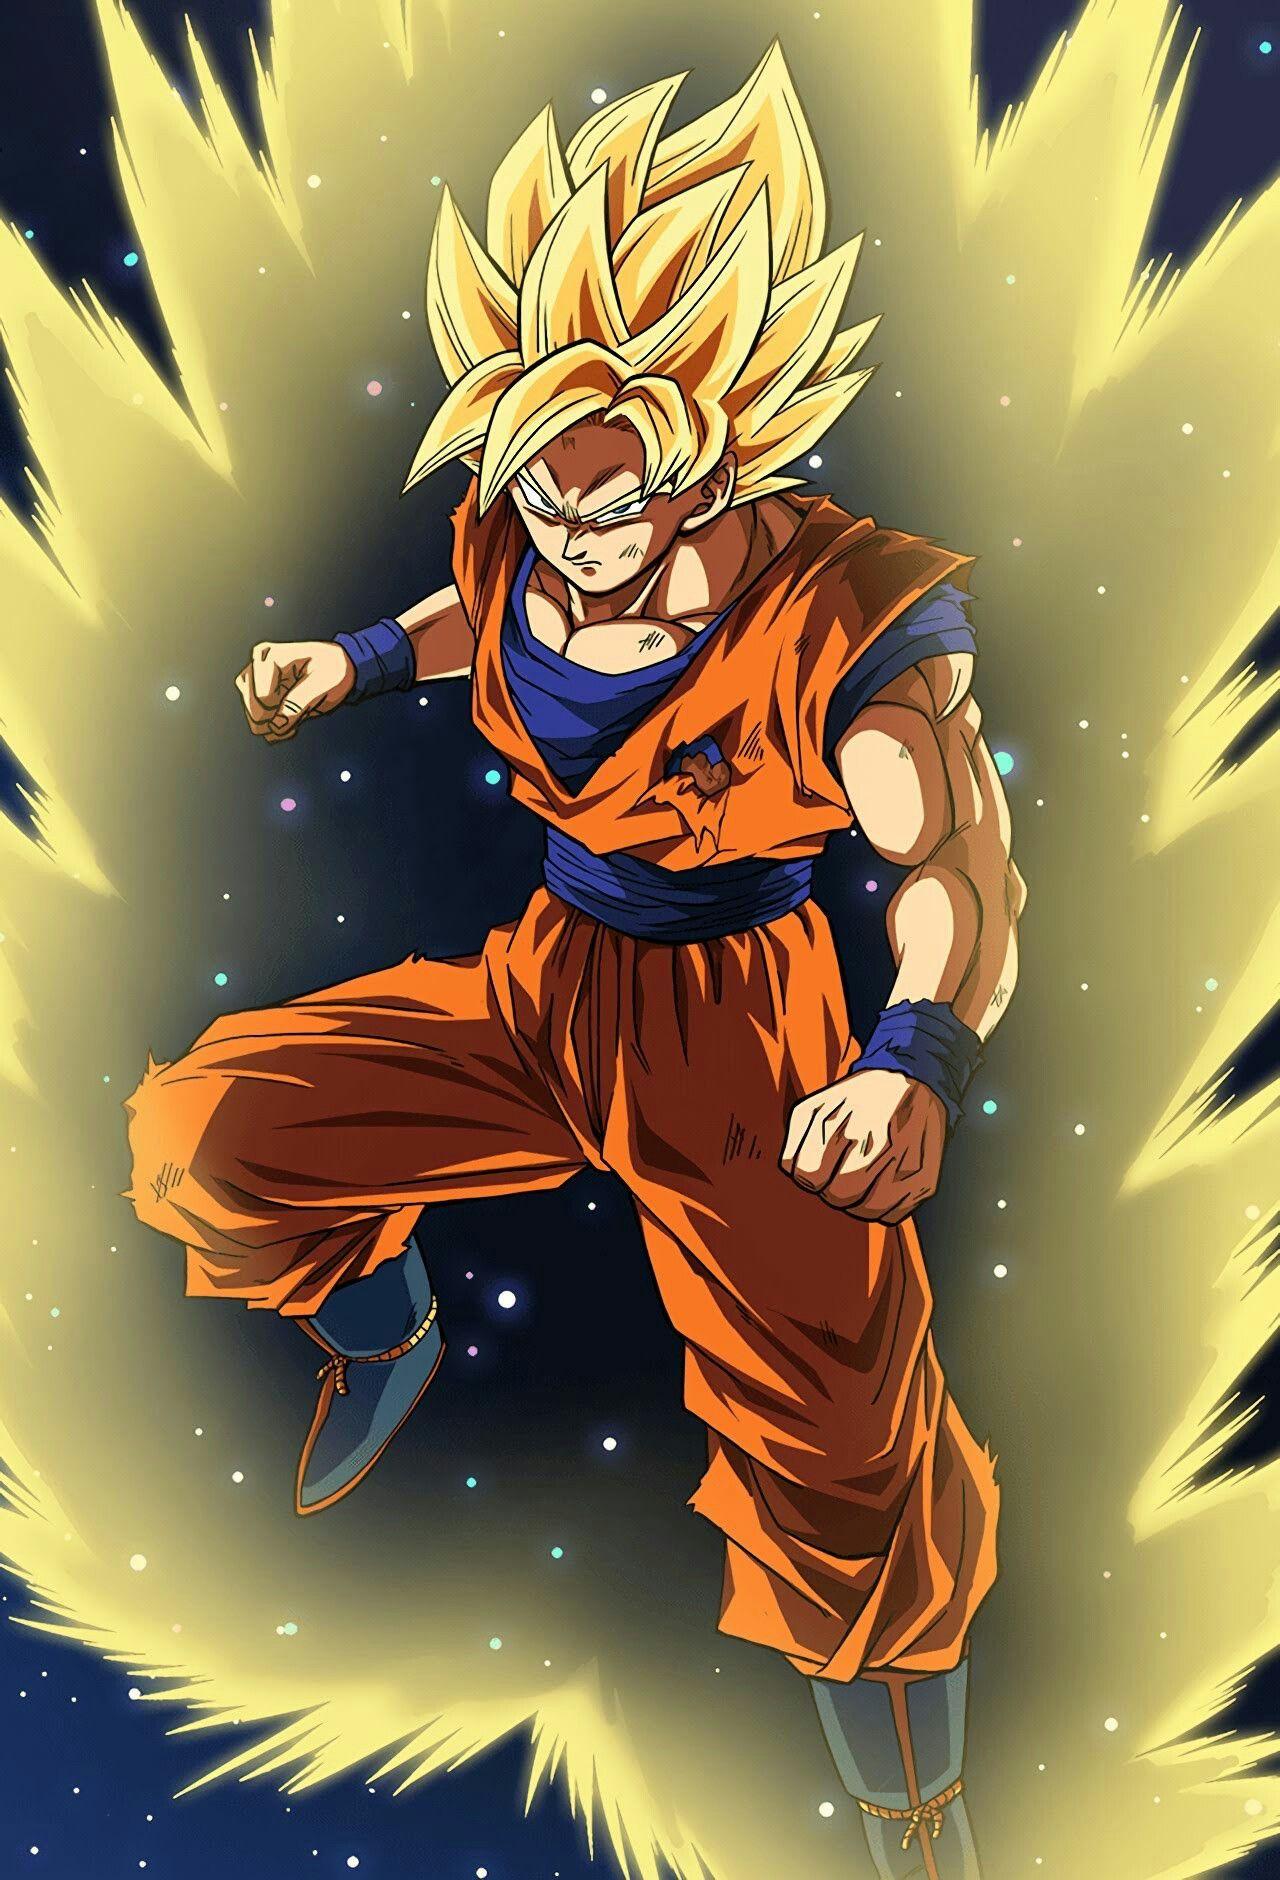 Ssj Goku W Anime Dragon Ball Super Anime Dragon Ball Goku Dragon Ball Super Manga Dragon ball z goku blue moon